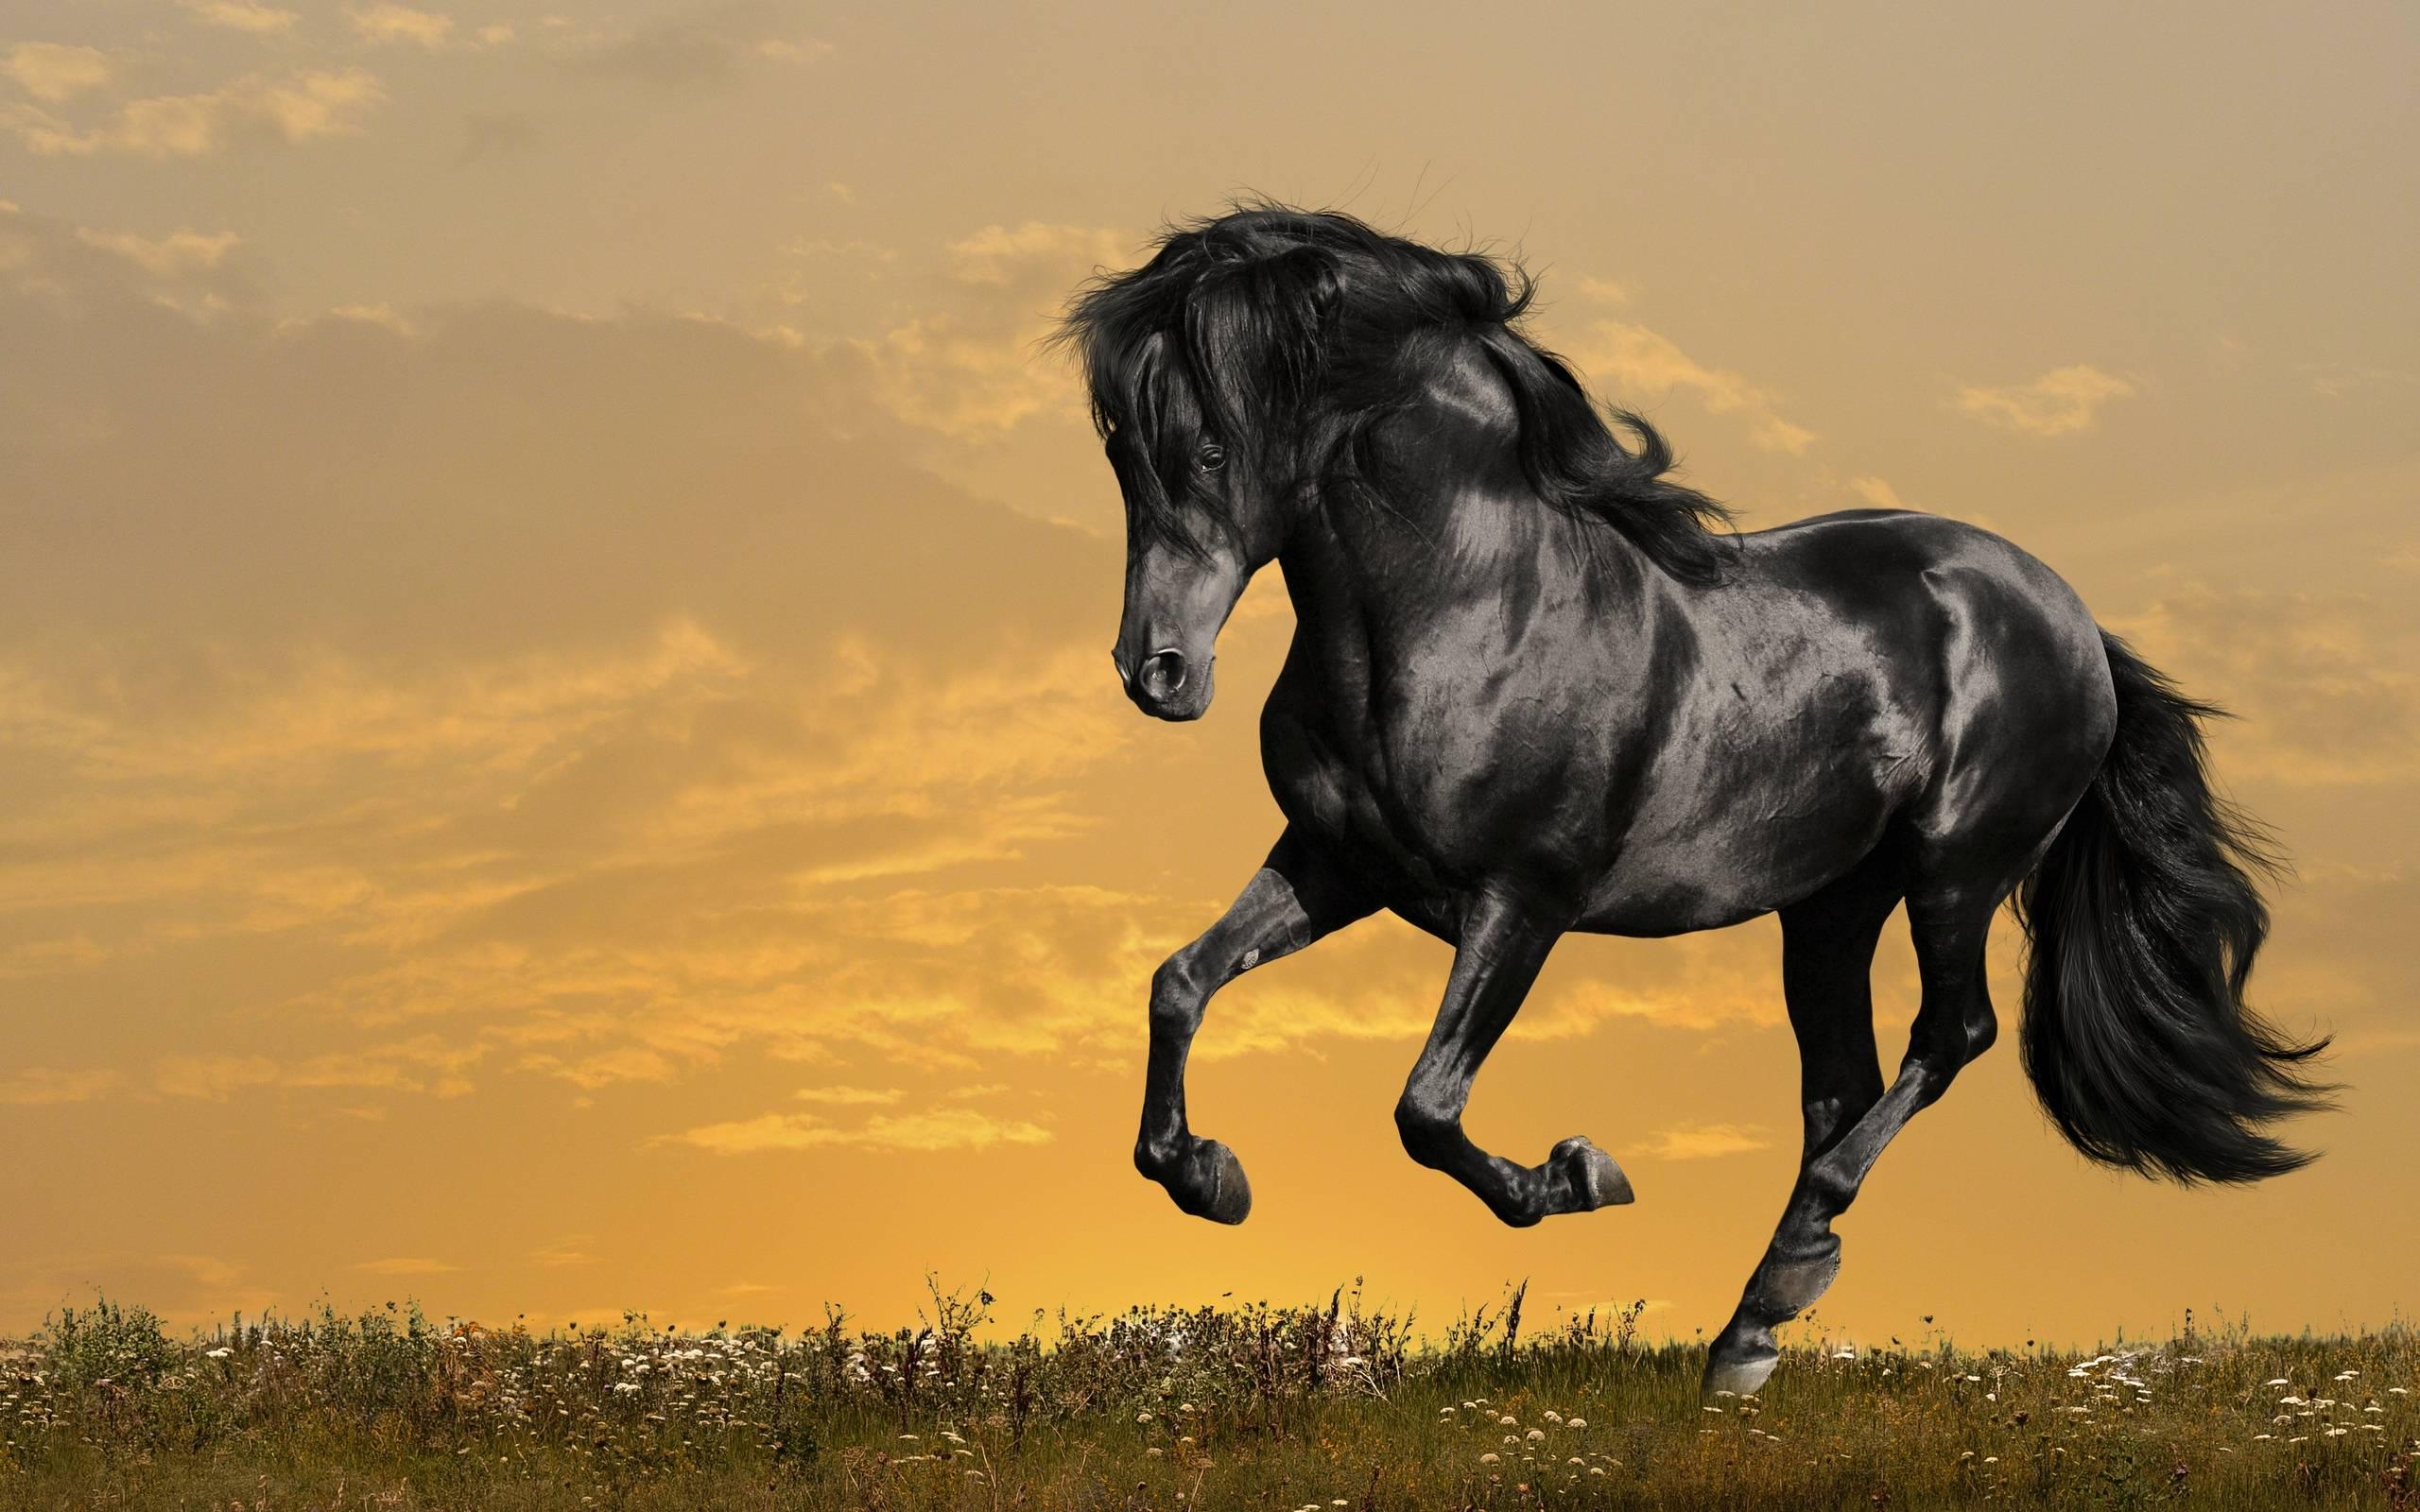 Horse wallpaper - Black Beauty Wallpapers - HD Wallpapers 95774